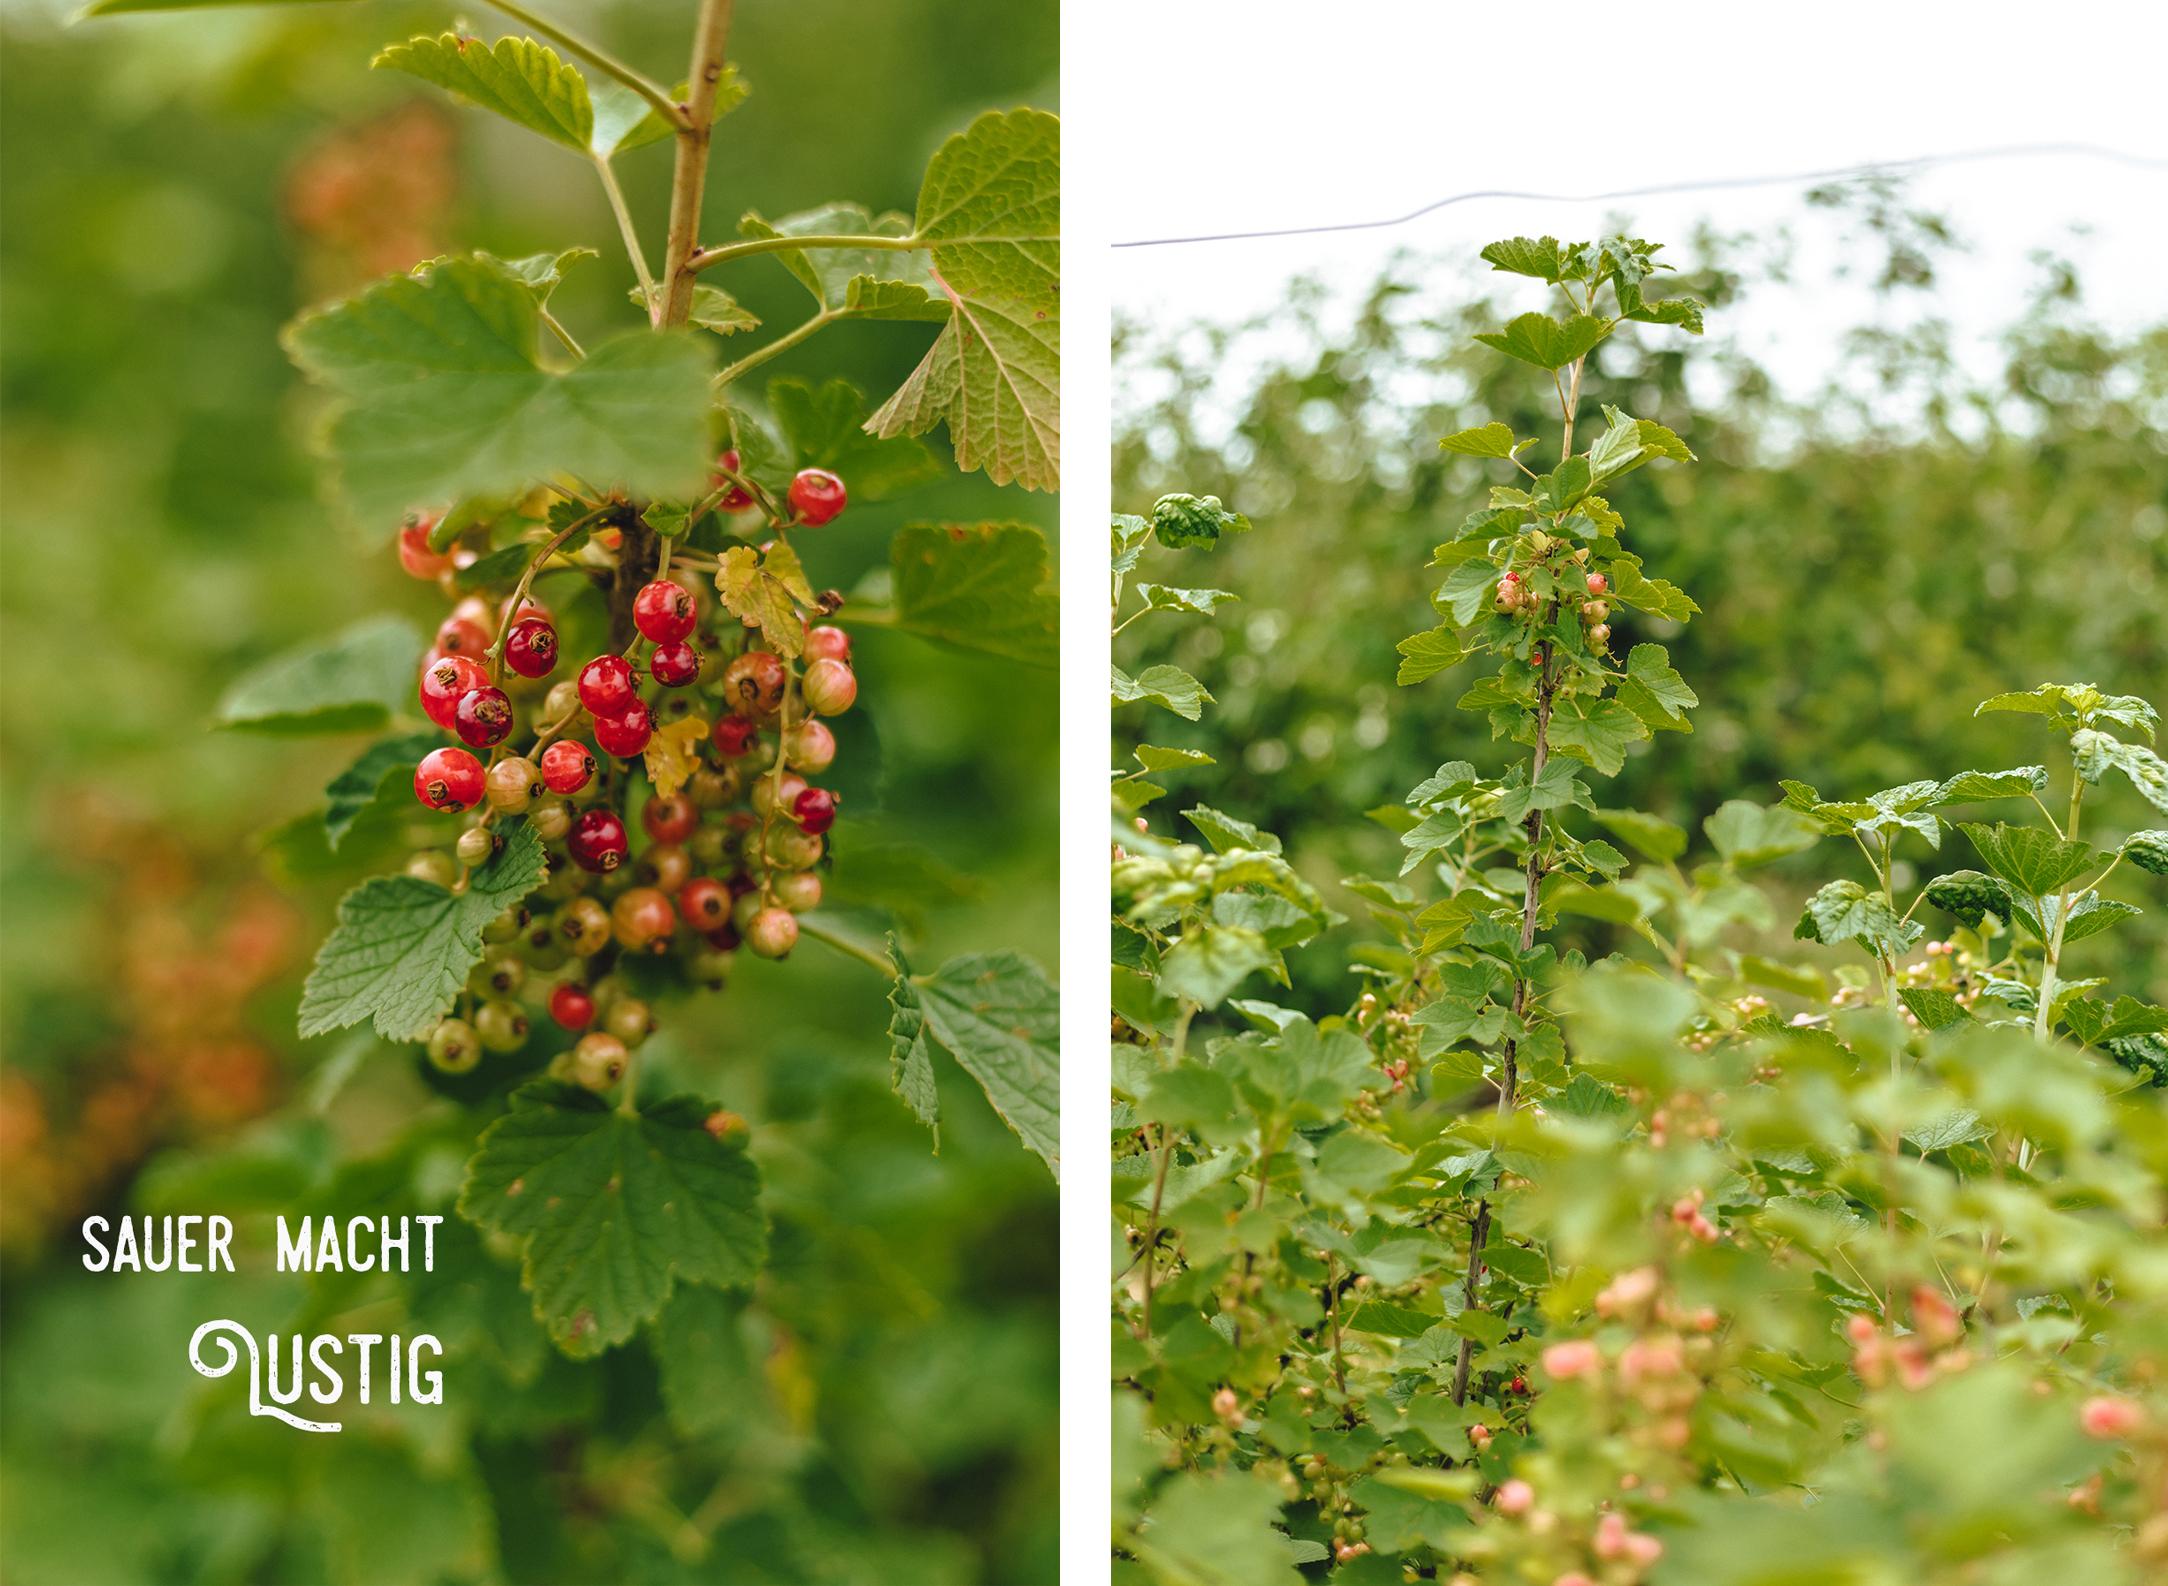 Erdbeer- und Himbeerhof Gut Steinwehr: Johannisbeeren